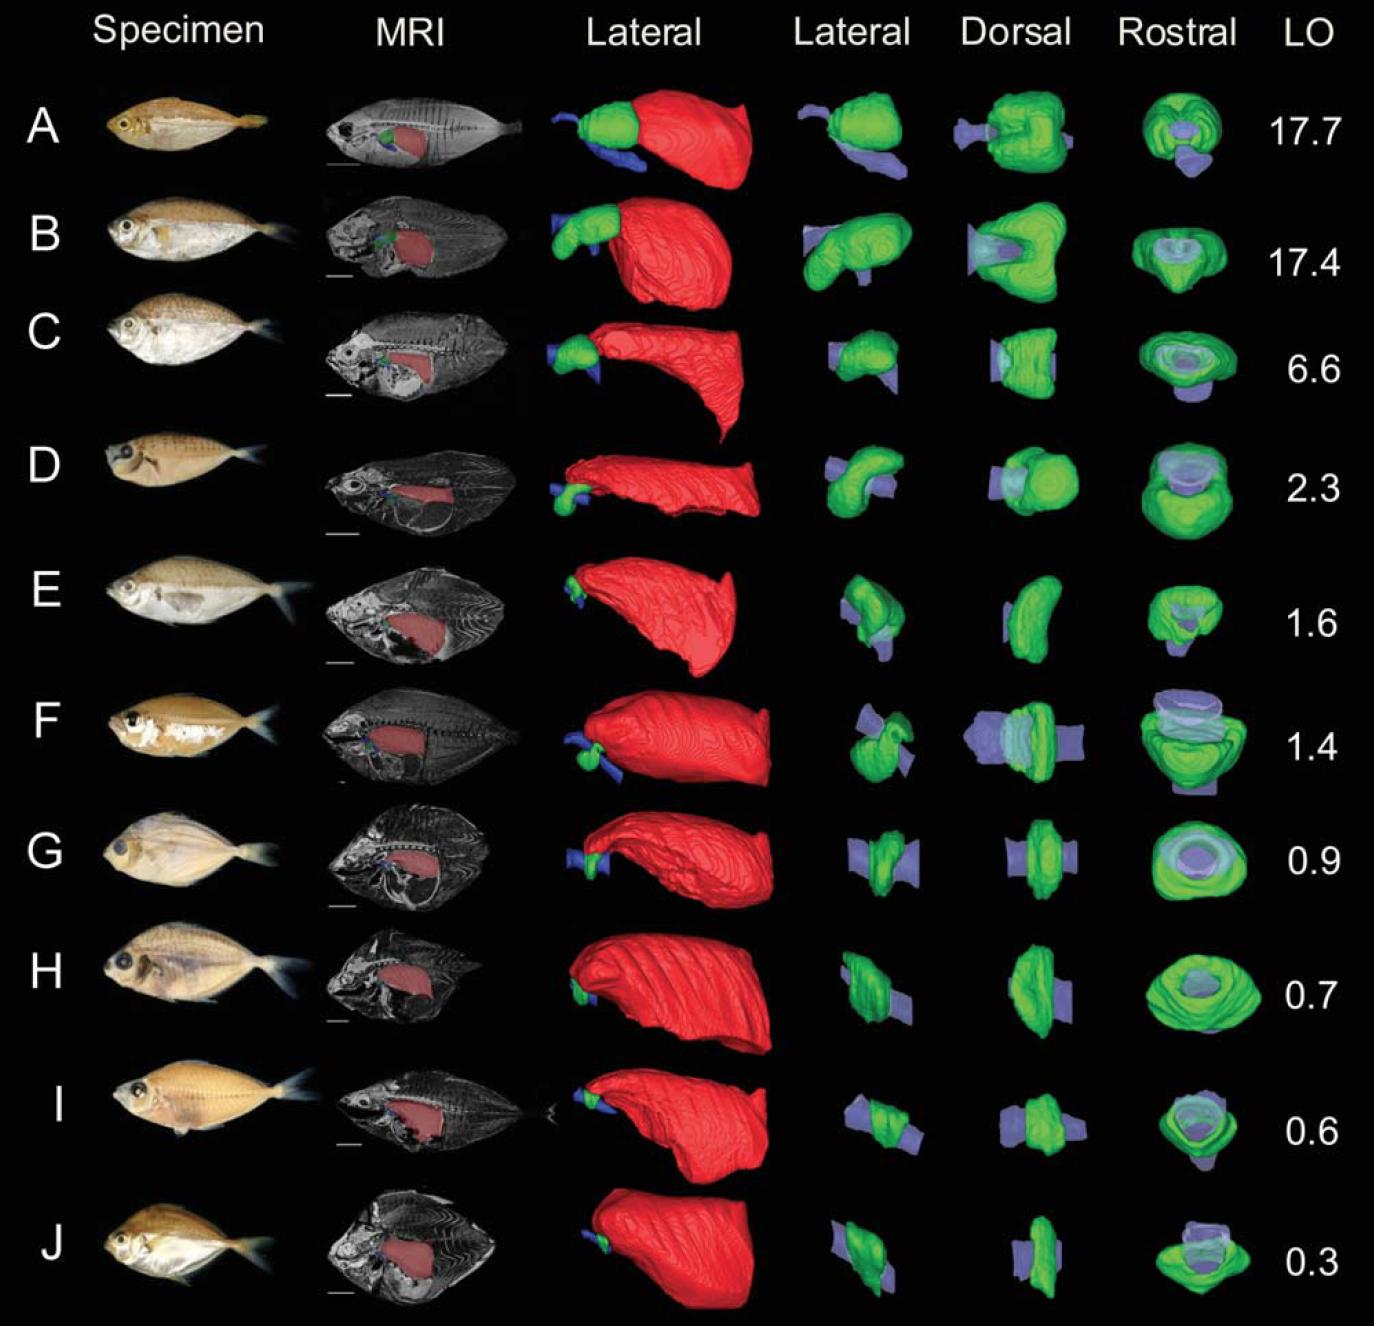 Light Organ Evolution in Ponyfishes - 09. Chakrabarty, P., Davis, M.P., Smith, W.L., Berquist, R., Gledhill, K.M., Frank, L.R., and Sparks, J.S. (2011). Evolution of the light organ system in ponyfishes (Teleostei: Leiognathidae). Journal of Morphology. (272) 6: 704-721.Google Scholar